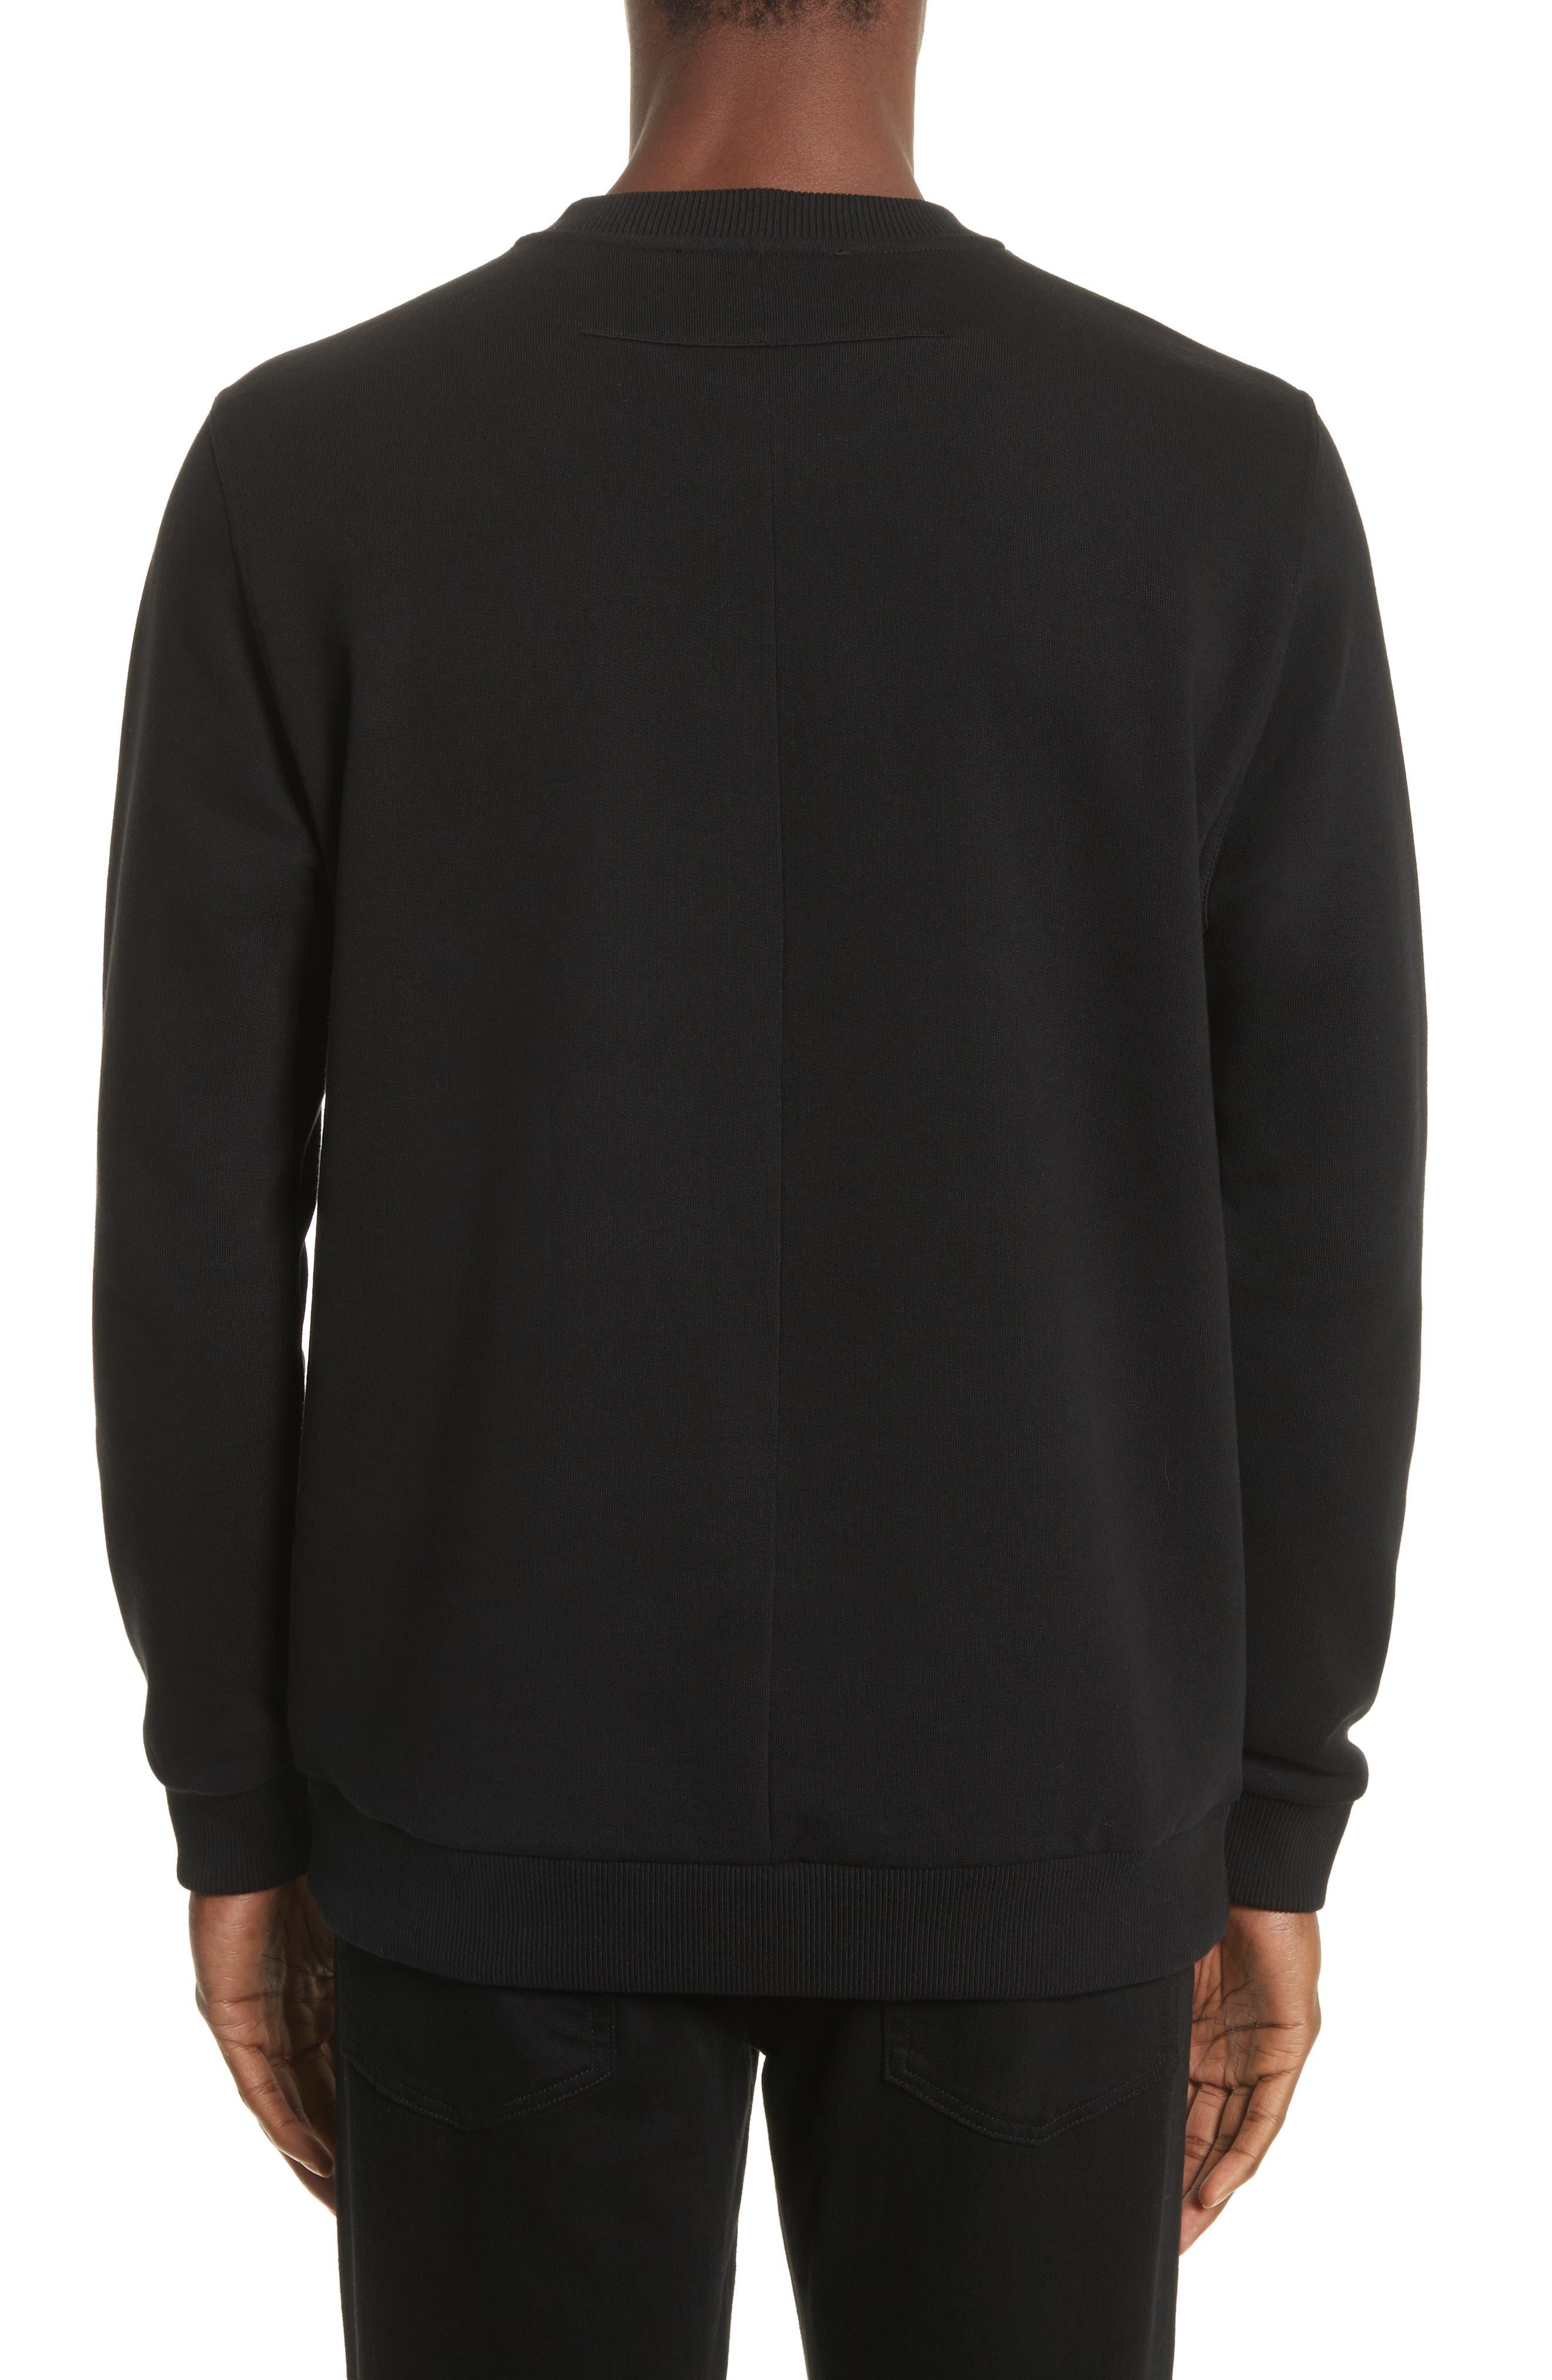 Flying Bands Crewneck Sweatshirt,                             Alternate thumbnail 2, color,                             Black